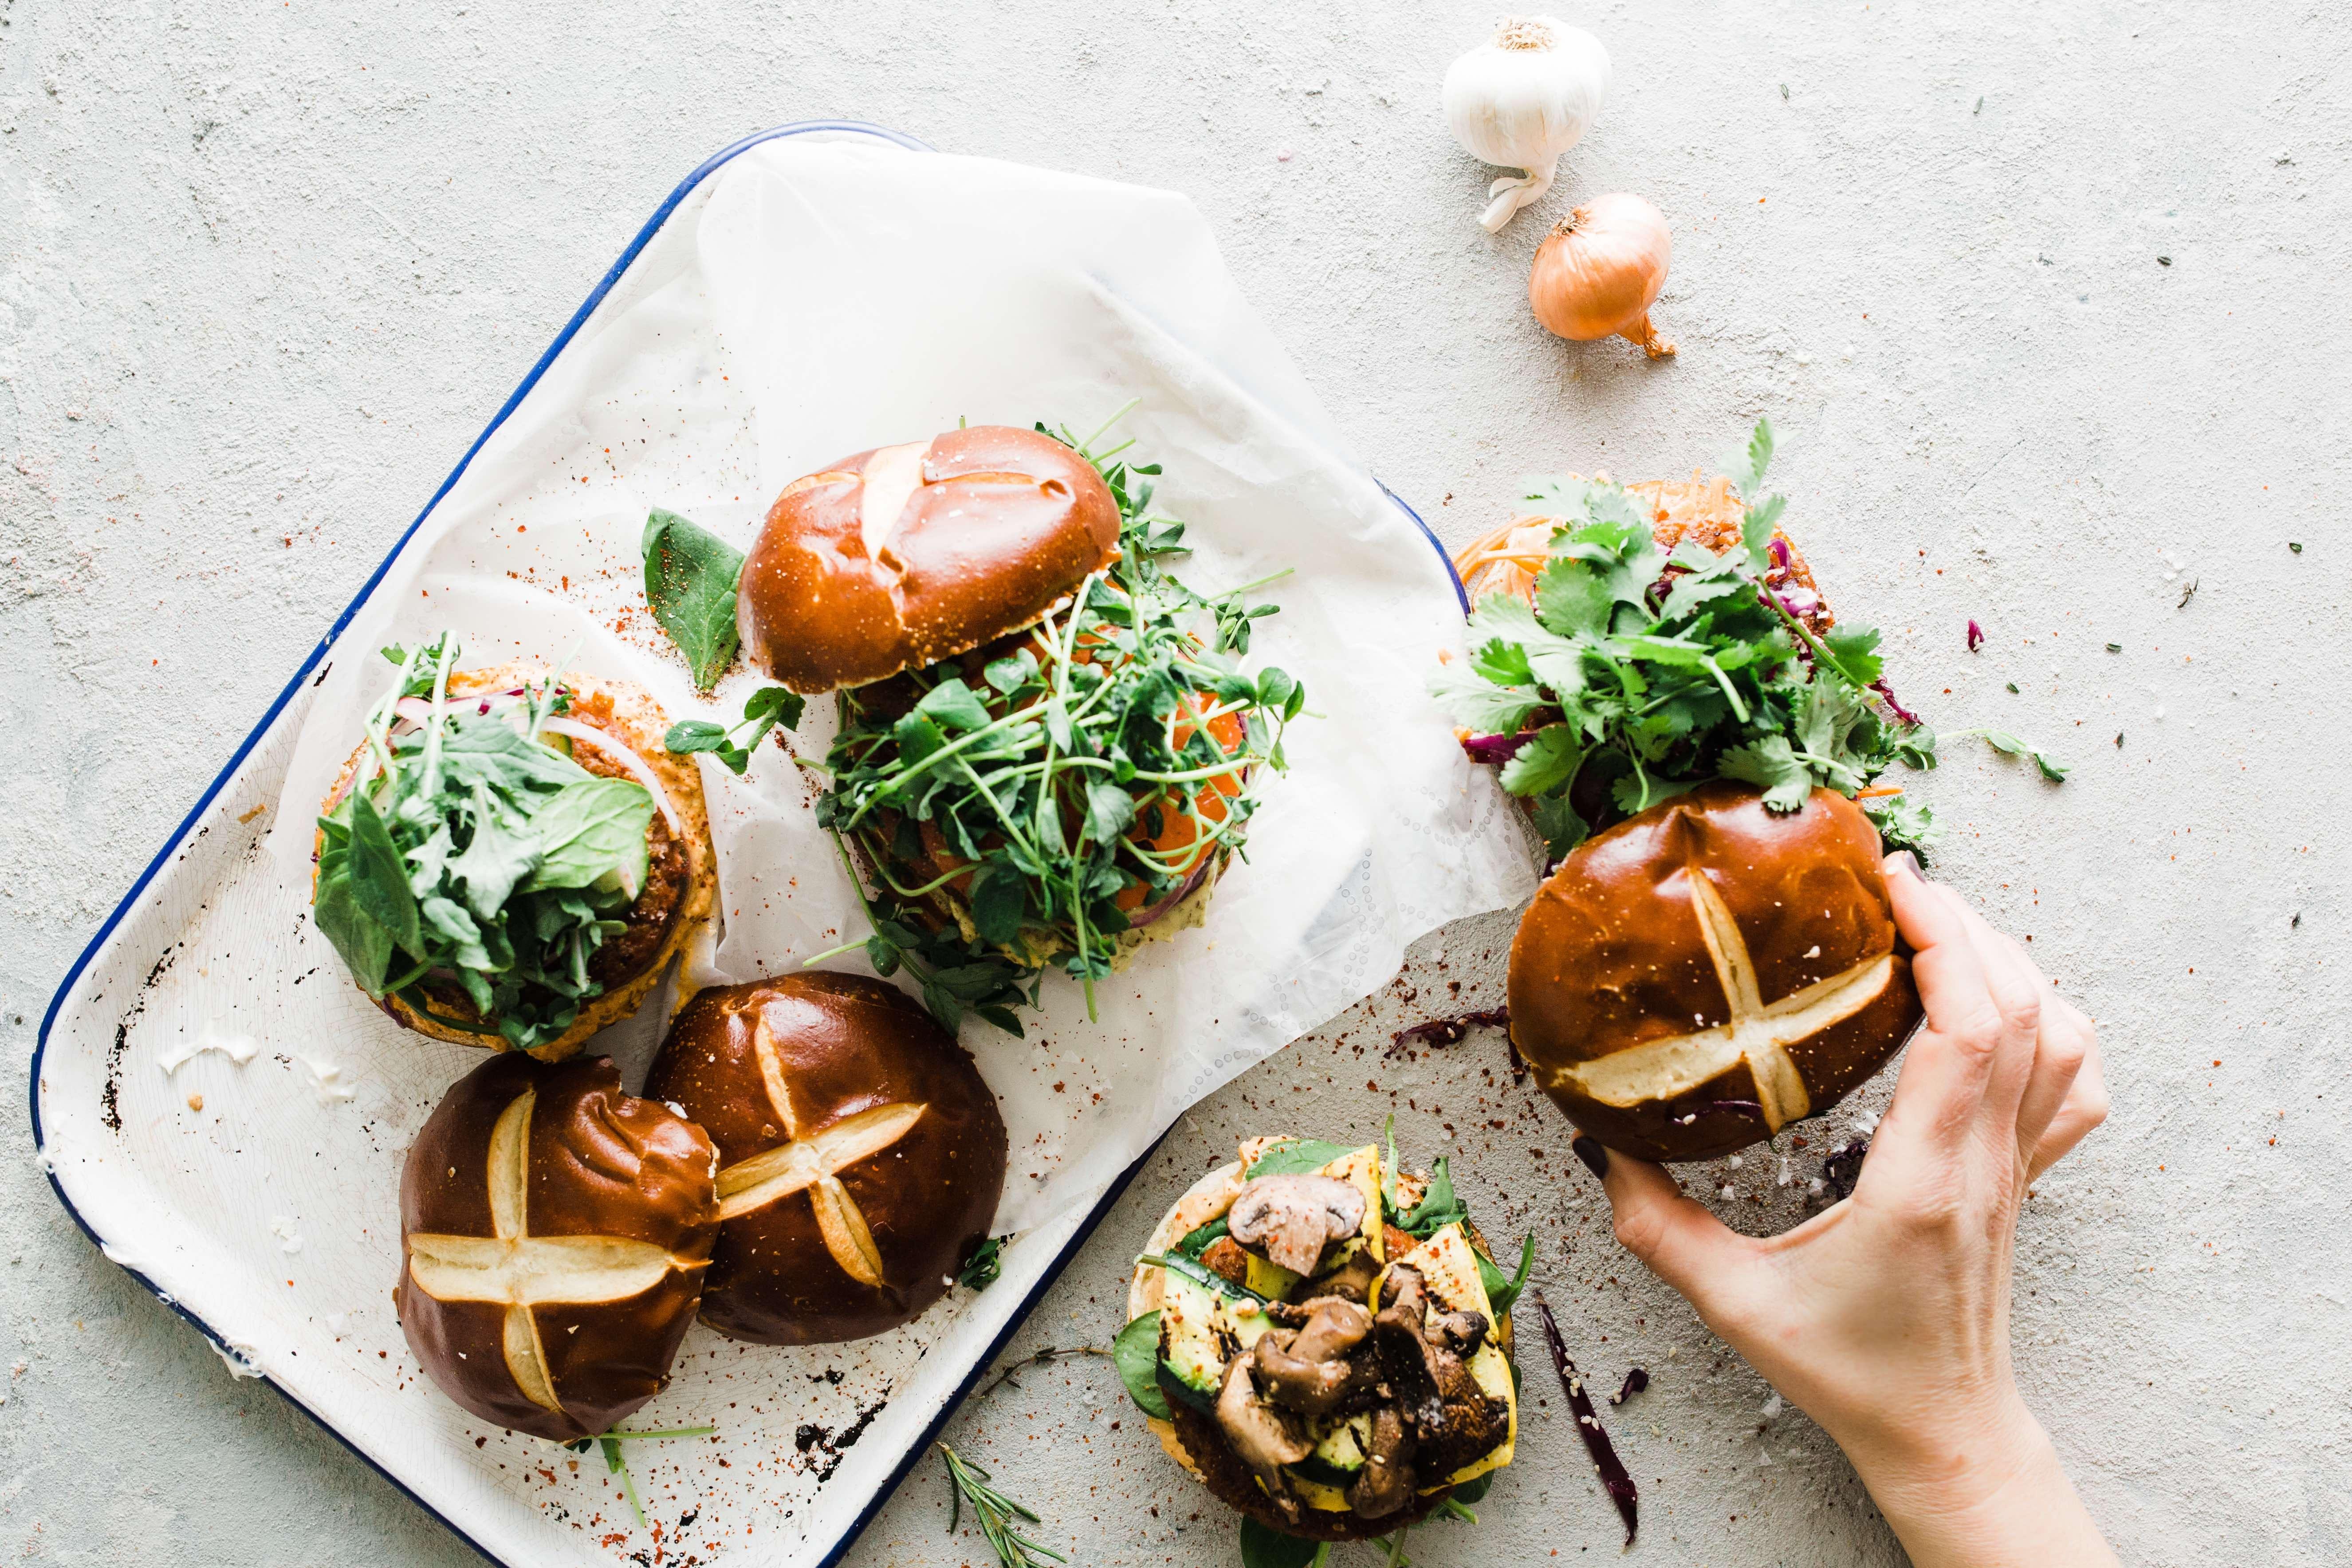 2018 02 05 Iha Pea Protein Plant Based Burgers B1 Resize